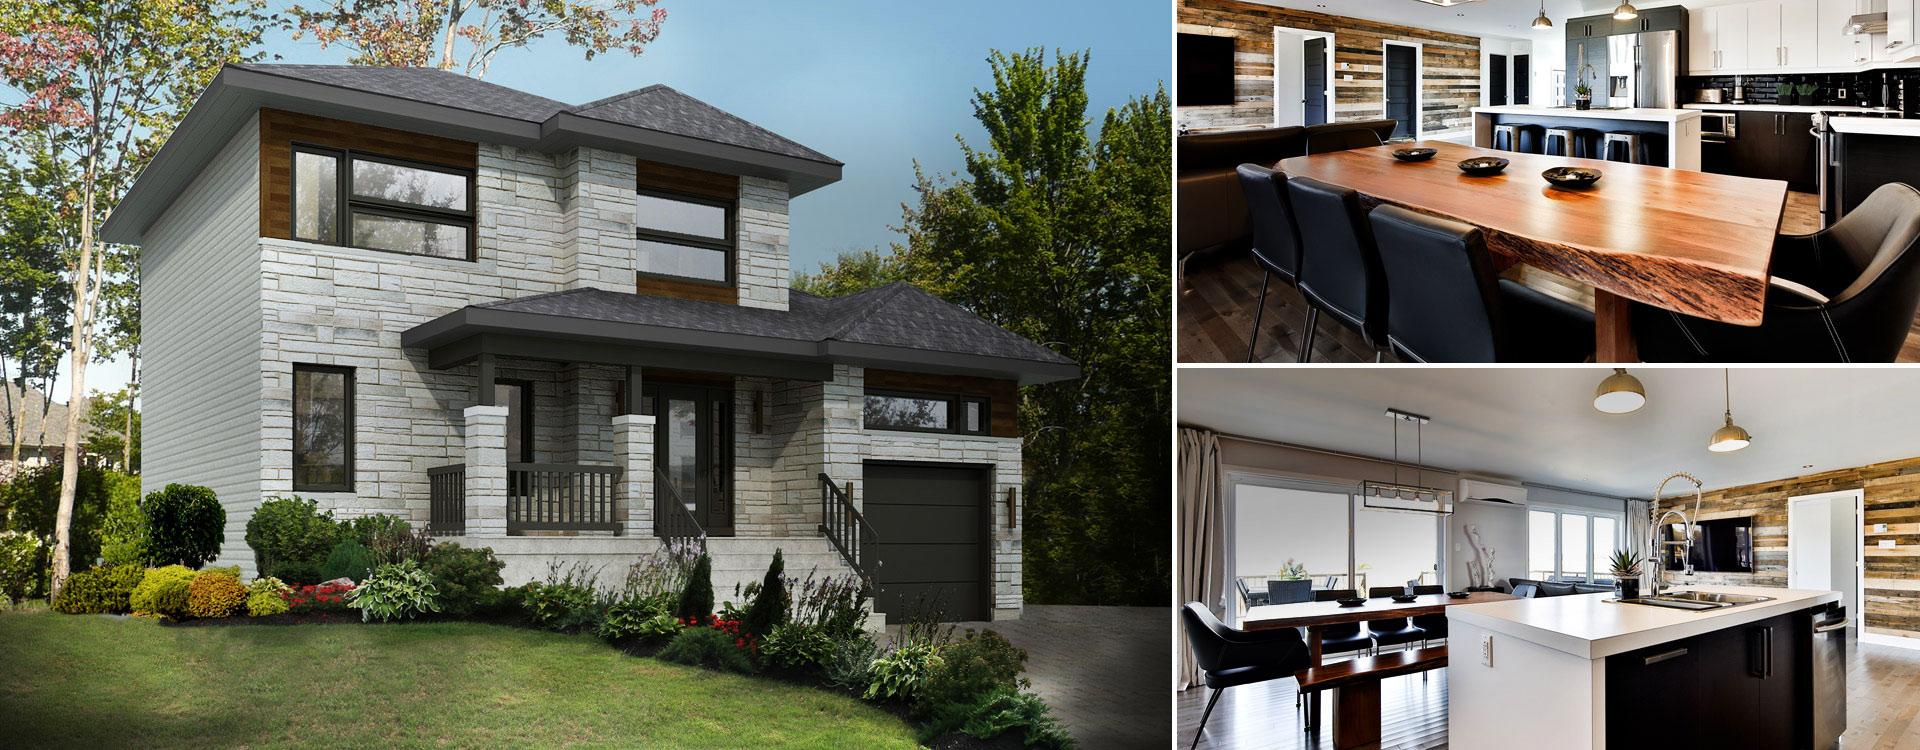 Maisons neuves vendre rive sud de montr al chambly for Habitation neuve